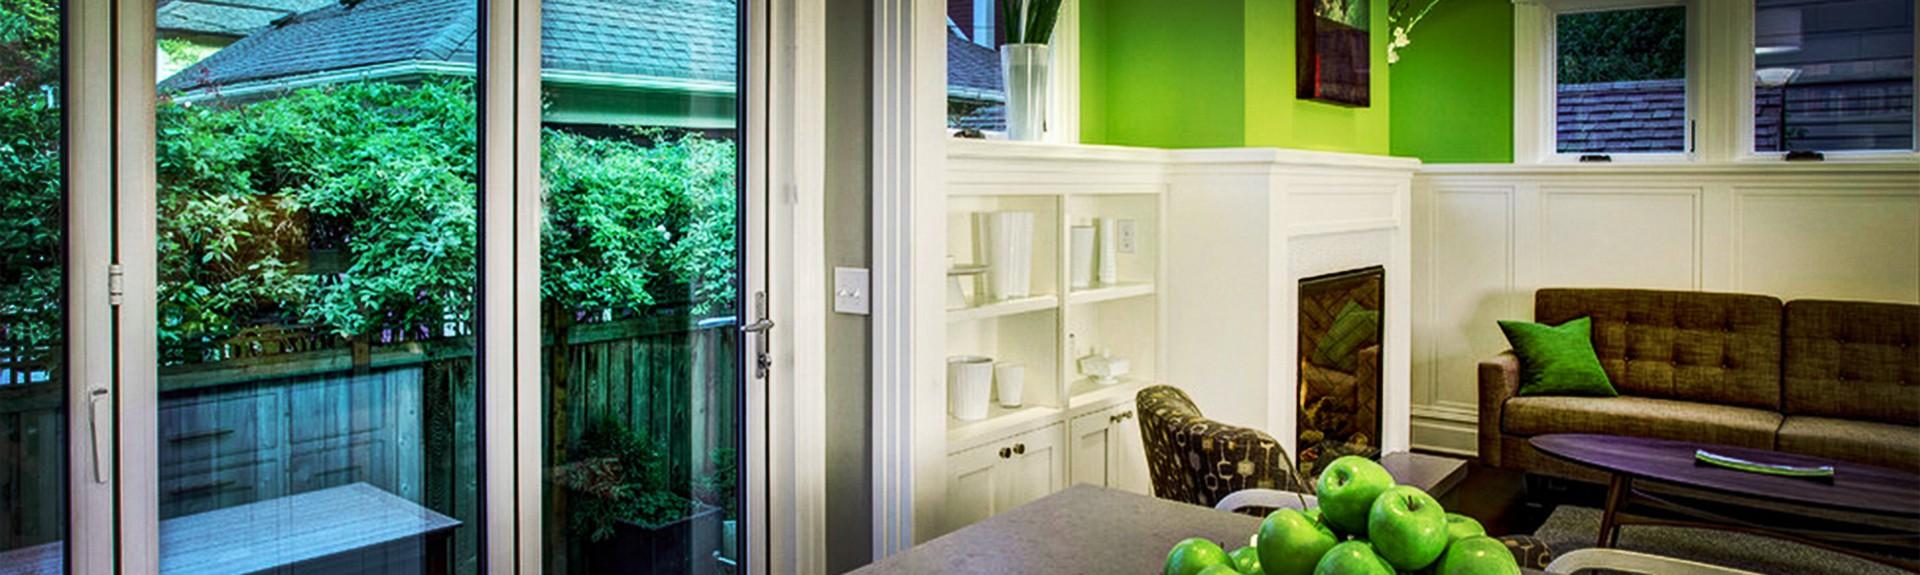 Knowles Team Real Estate – Keller Williams Realty Greater Seattle